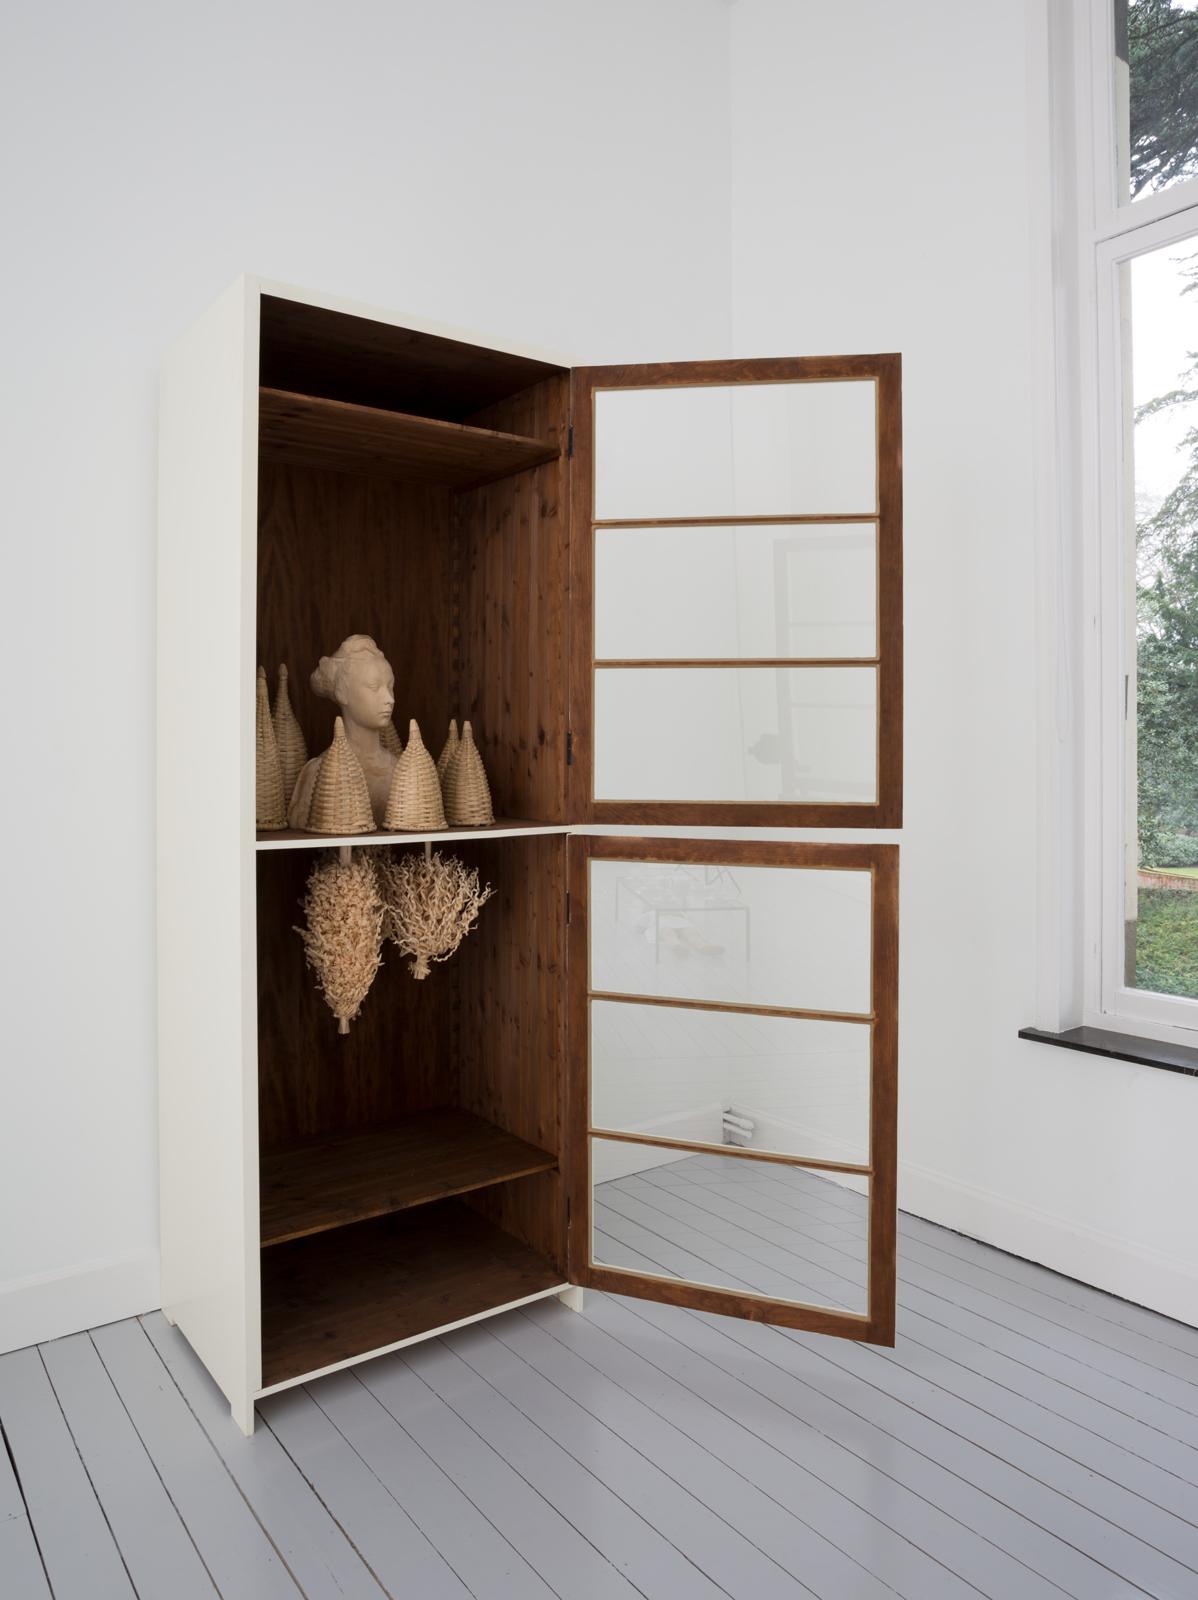 Paloma Varga Weisz   Bois Dormant – Cabinet 5  2015 Wood, glass 250 x 90 x 64 cm